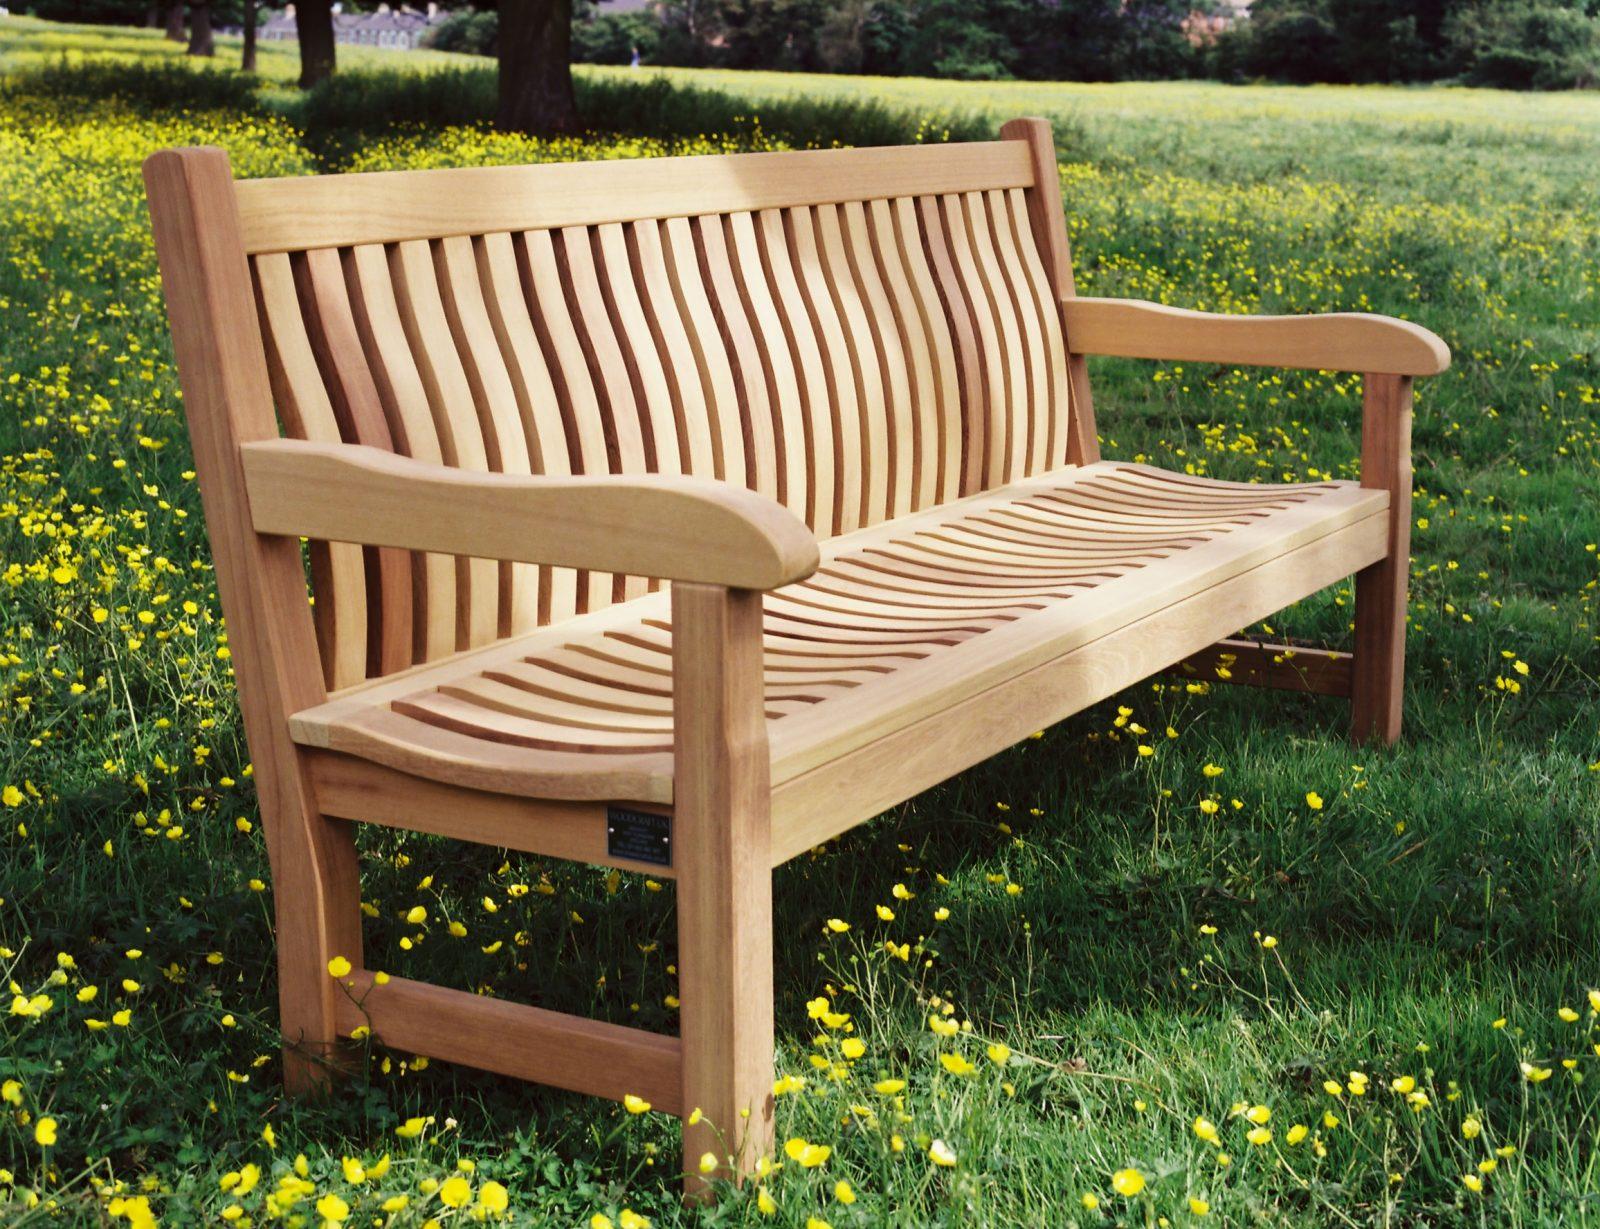 The Scarborough Wooden Garden Bench and Memorial Seat ...